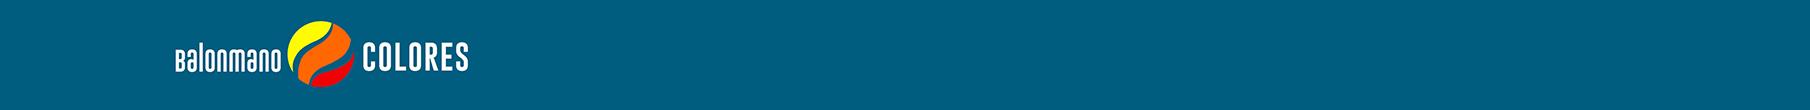 logotipo_balonmano_colores01